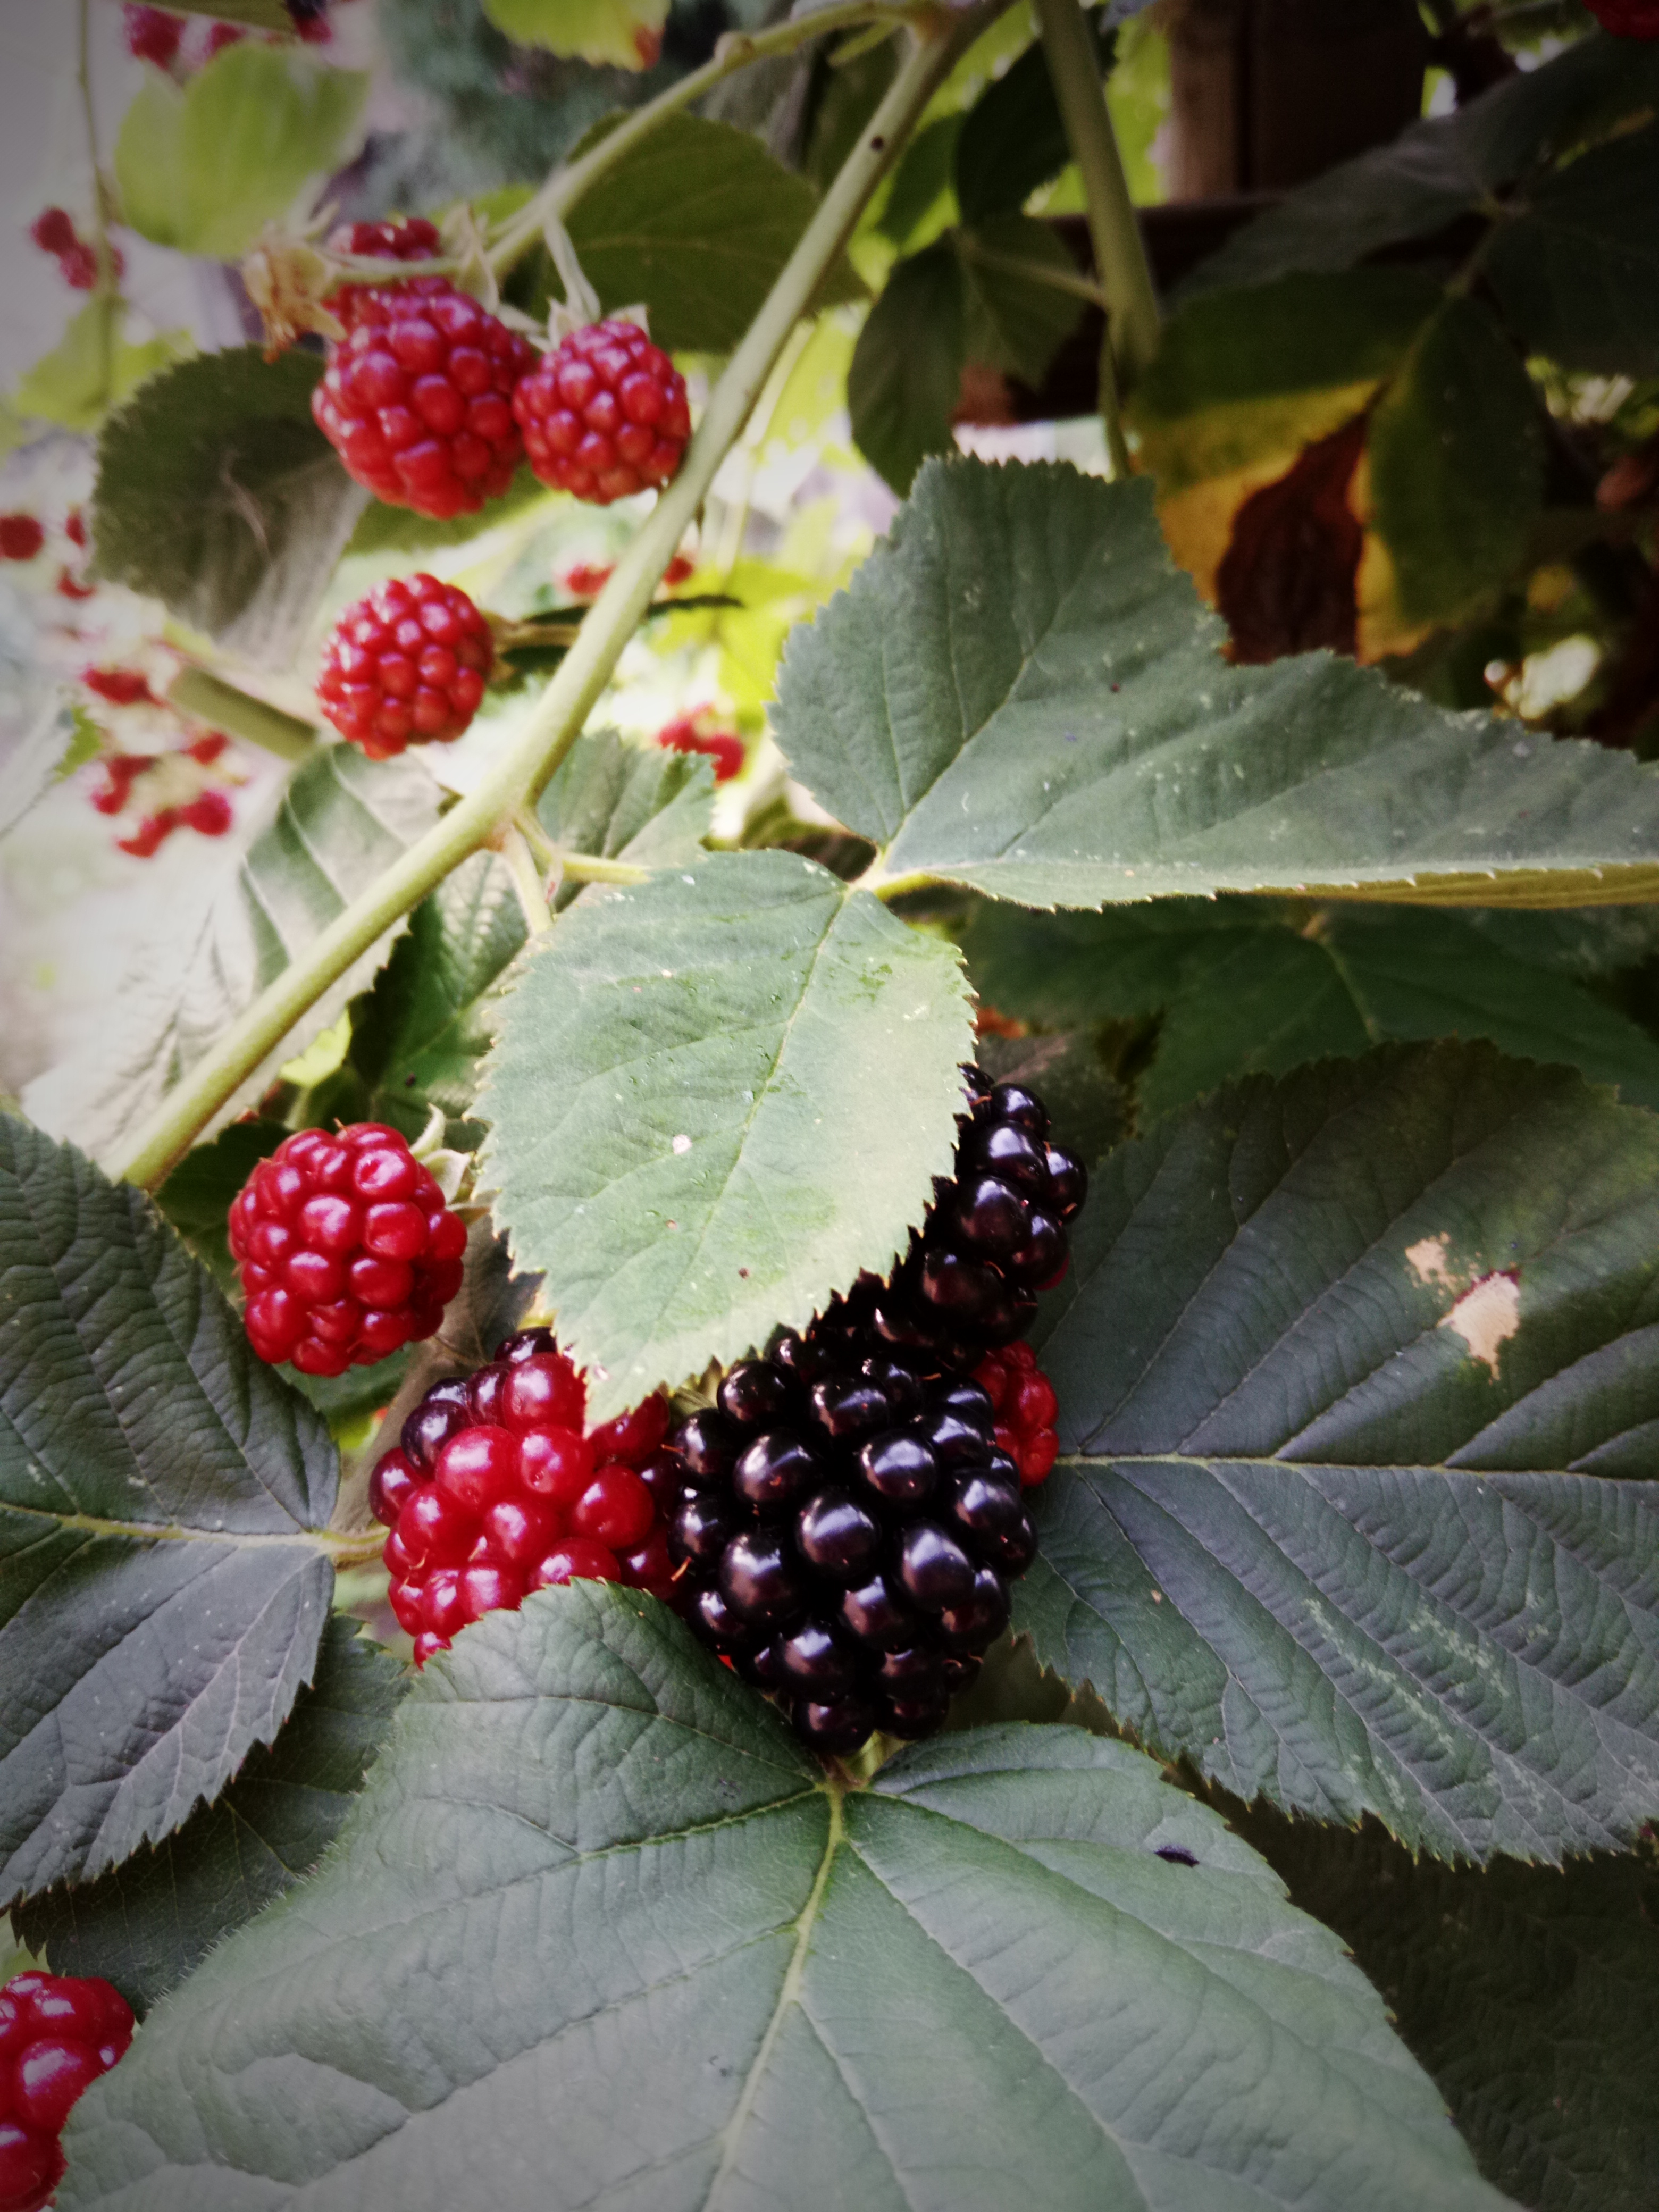 Brombeere, Blackberry, Rubus fruticosus…